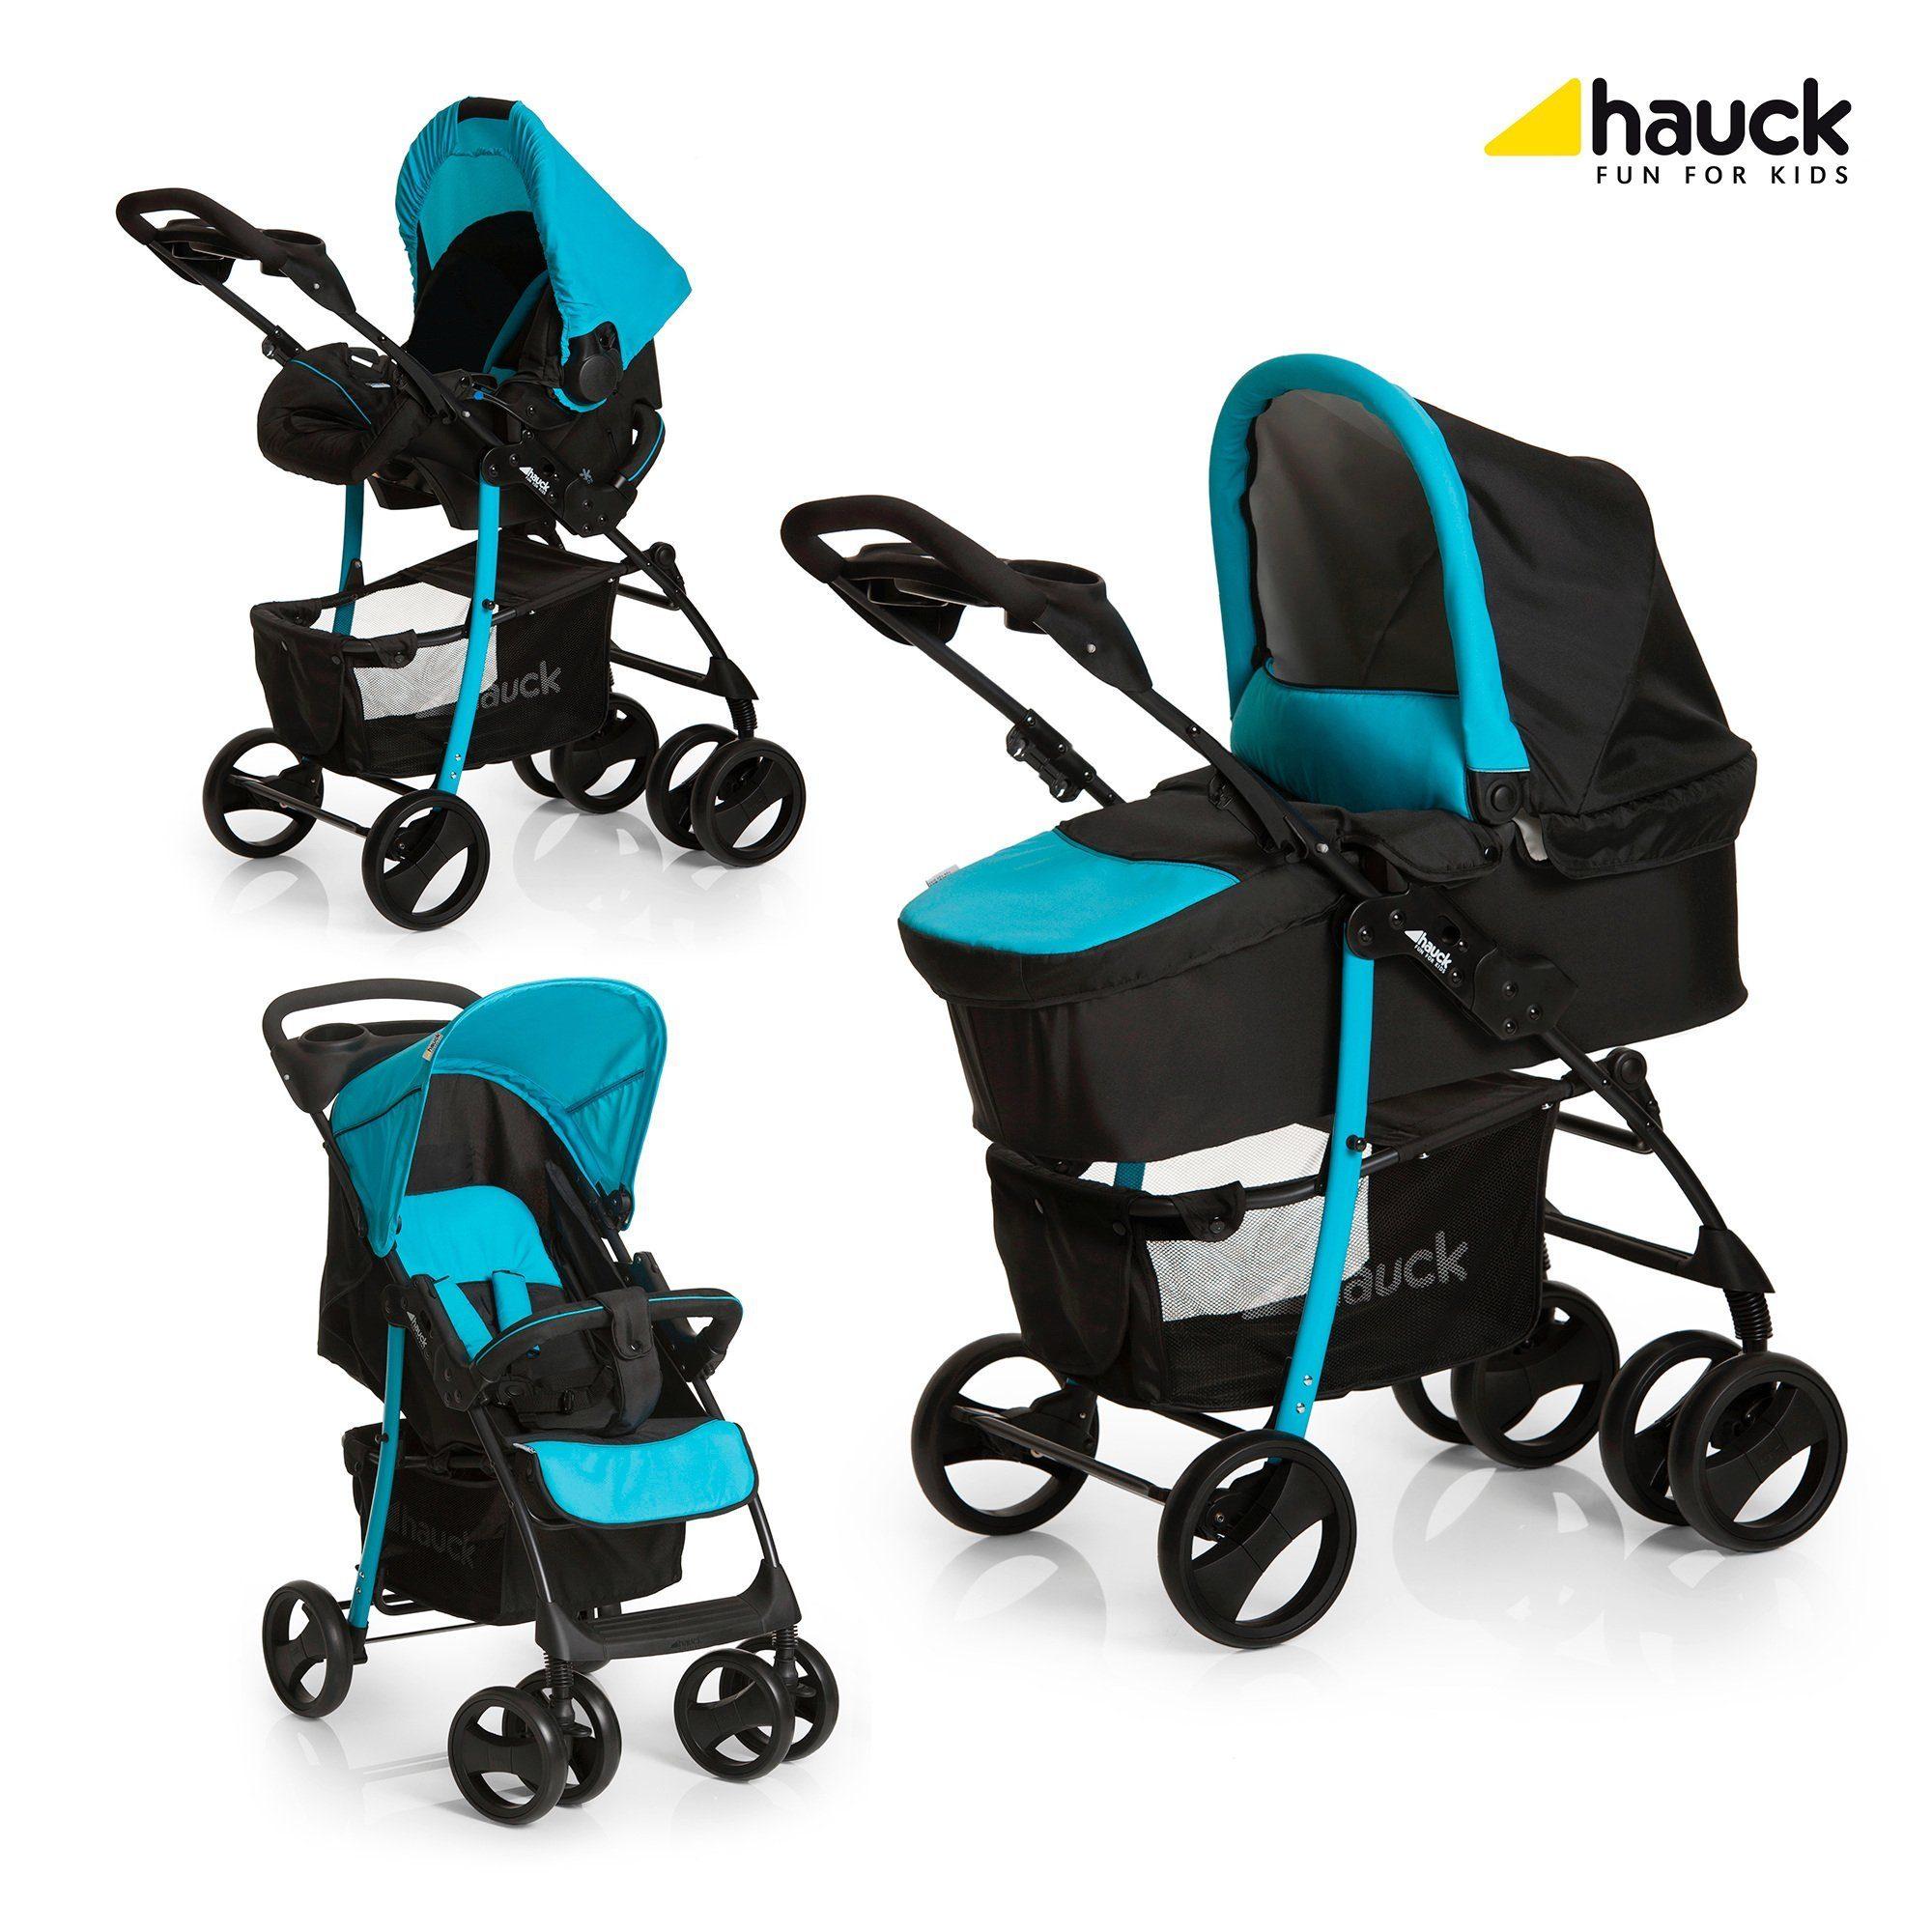 HAUCK Shopper SLX Kombikinderwagen Trio-Set Design 2016